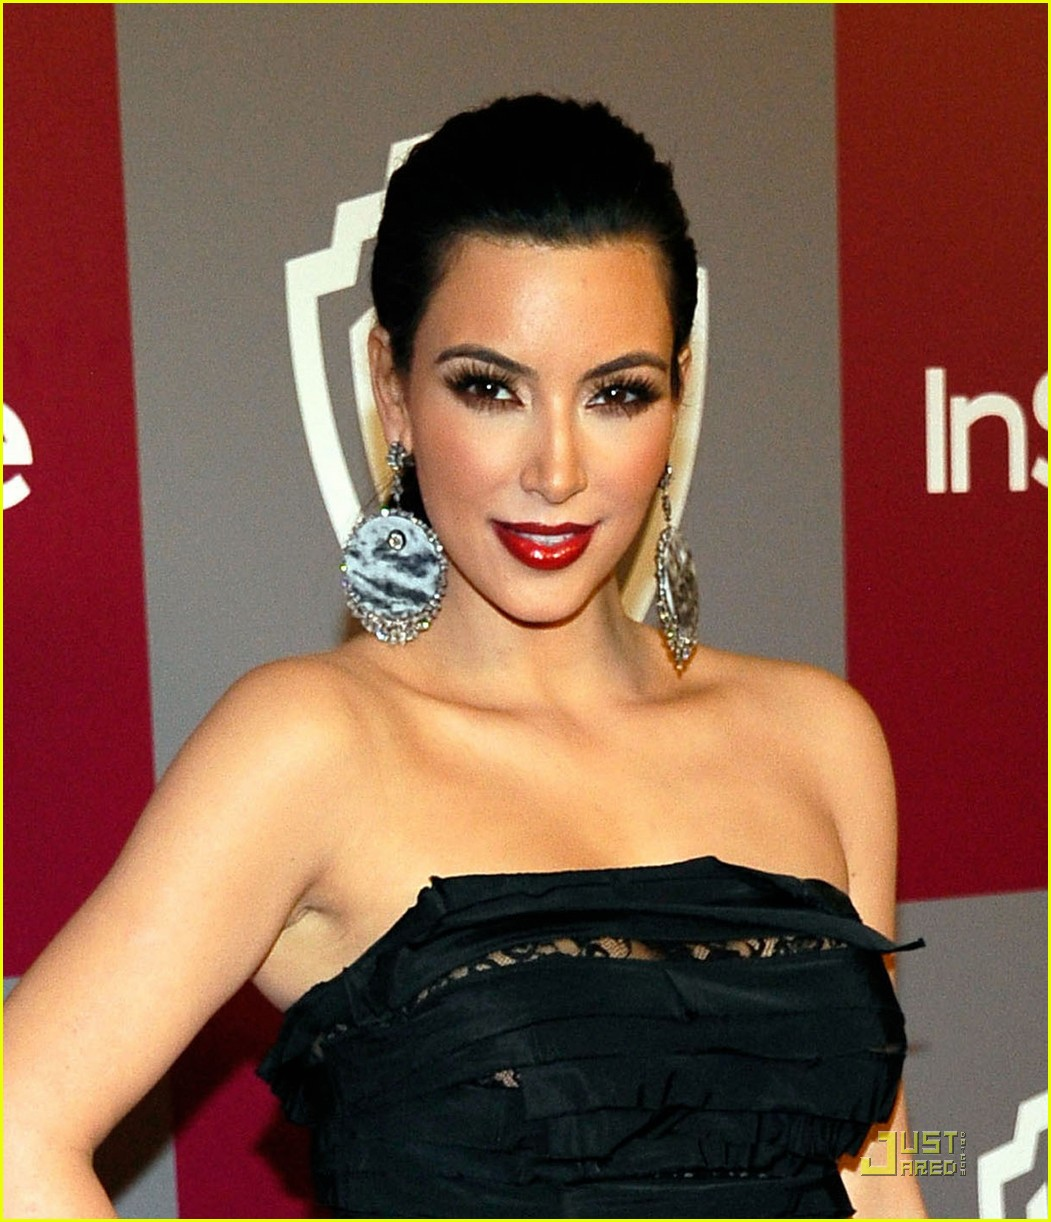 http://3.bp.blogspot.com/_D8F3i-eBOGM/TTR7dkyL48I/AAAAAAAACr0/yeJCDr4L1pw/s1600/kim-kardashian-instyle-party-01.jpg